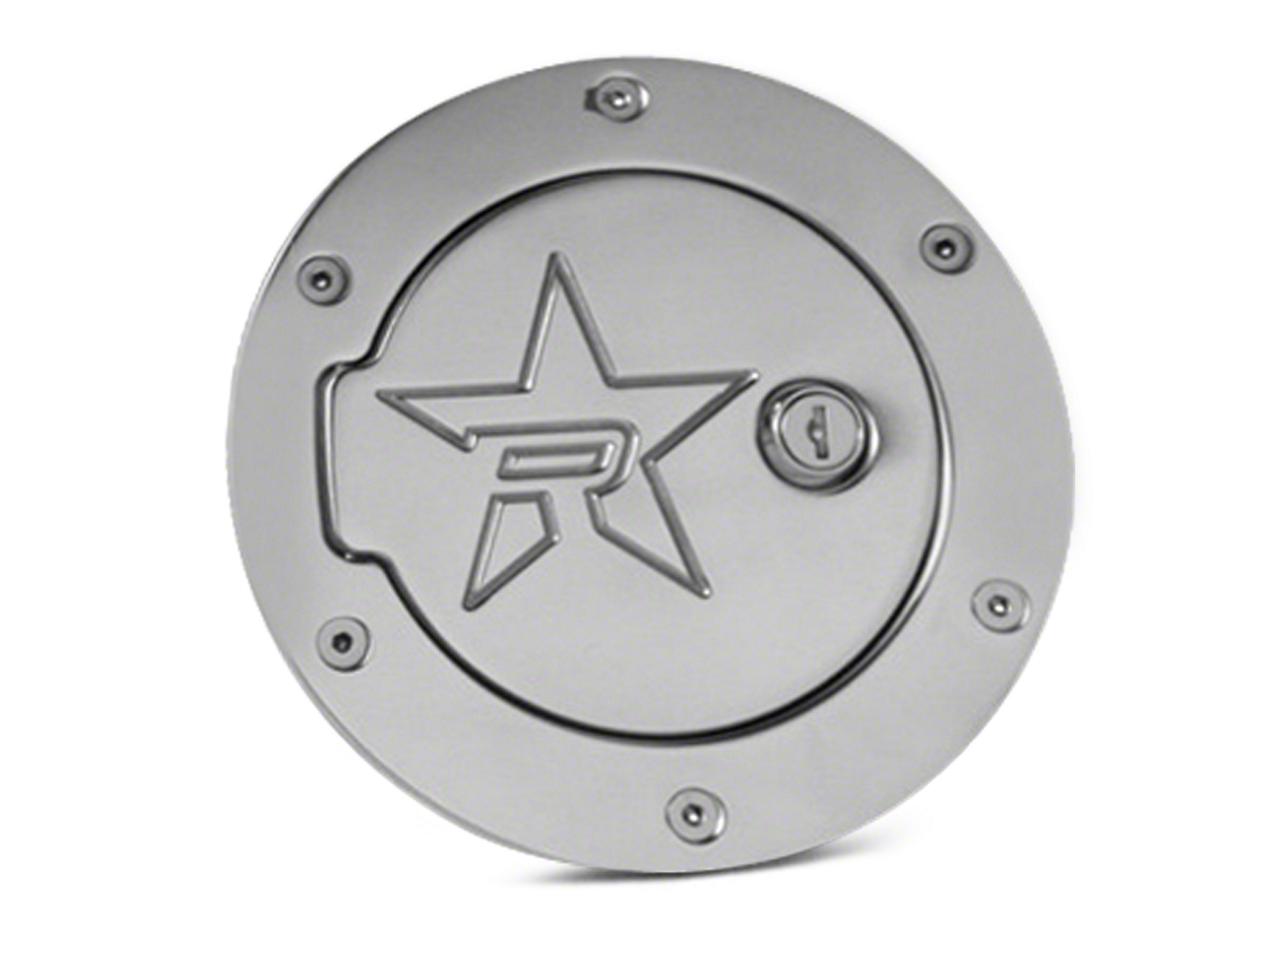 RBP RX-2 Locking Fuel Door - Polished Aluminum (97-03 F-150 Styleside)